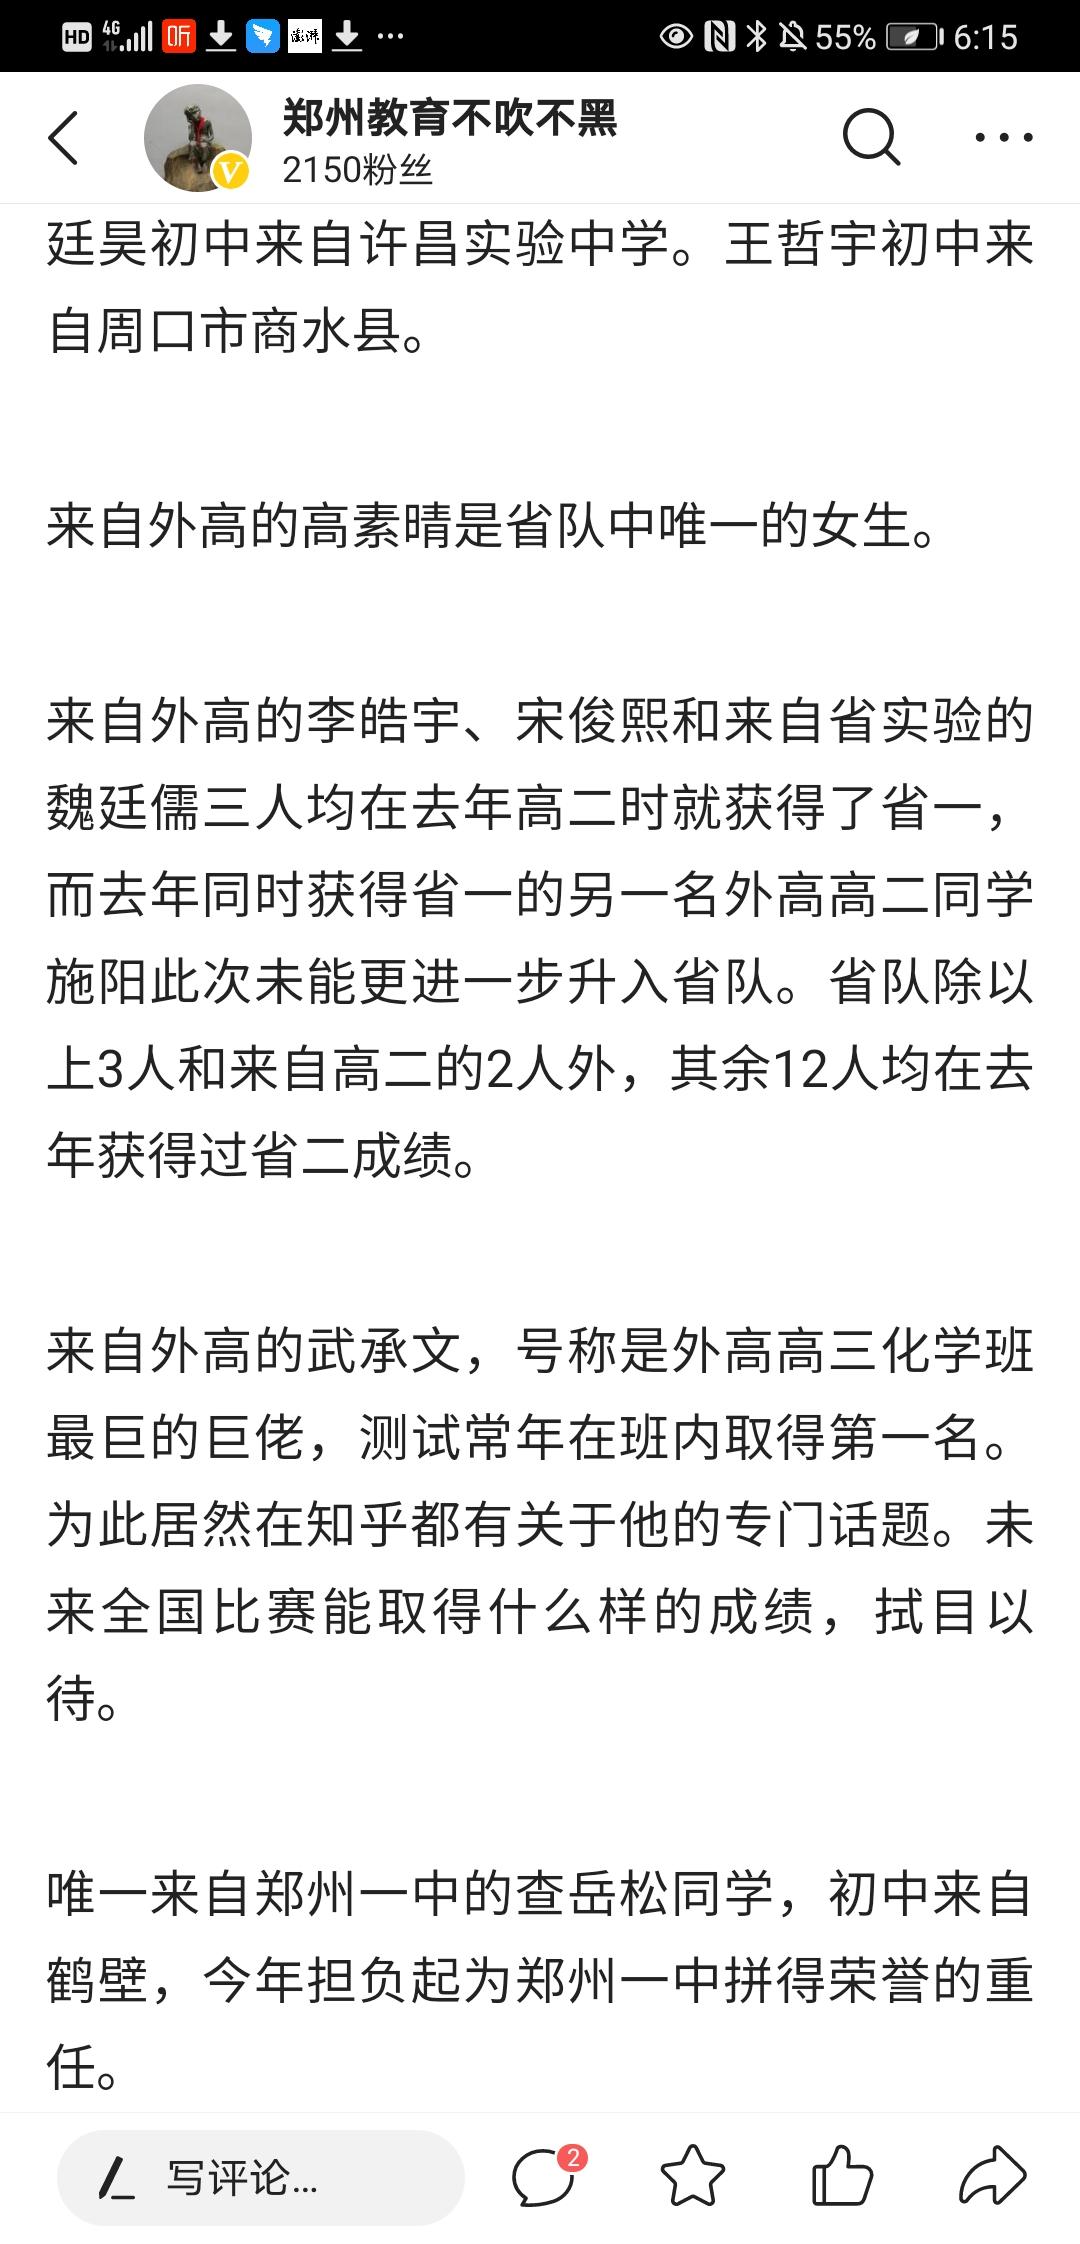 Screenshot_20201018_181519_com.ss.android.article.news.jpg